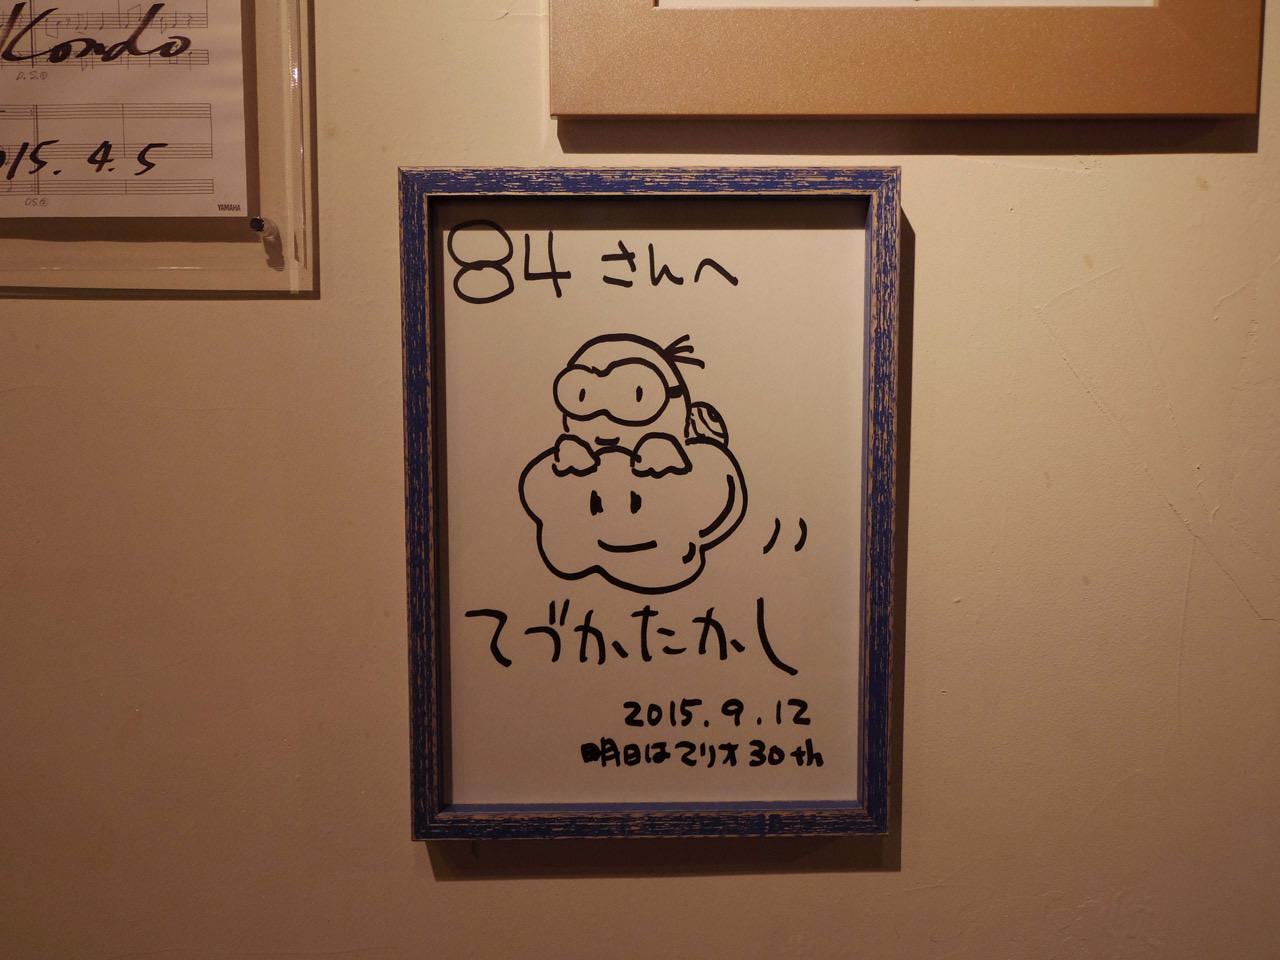 takashi tezuka autograph